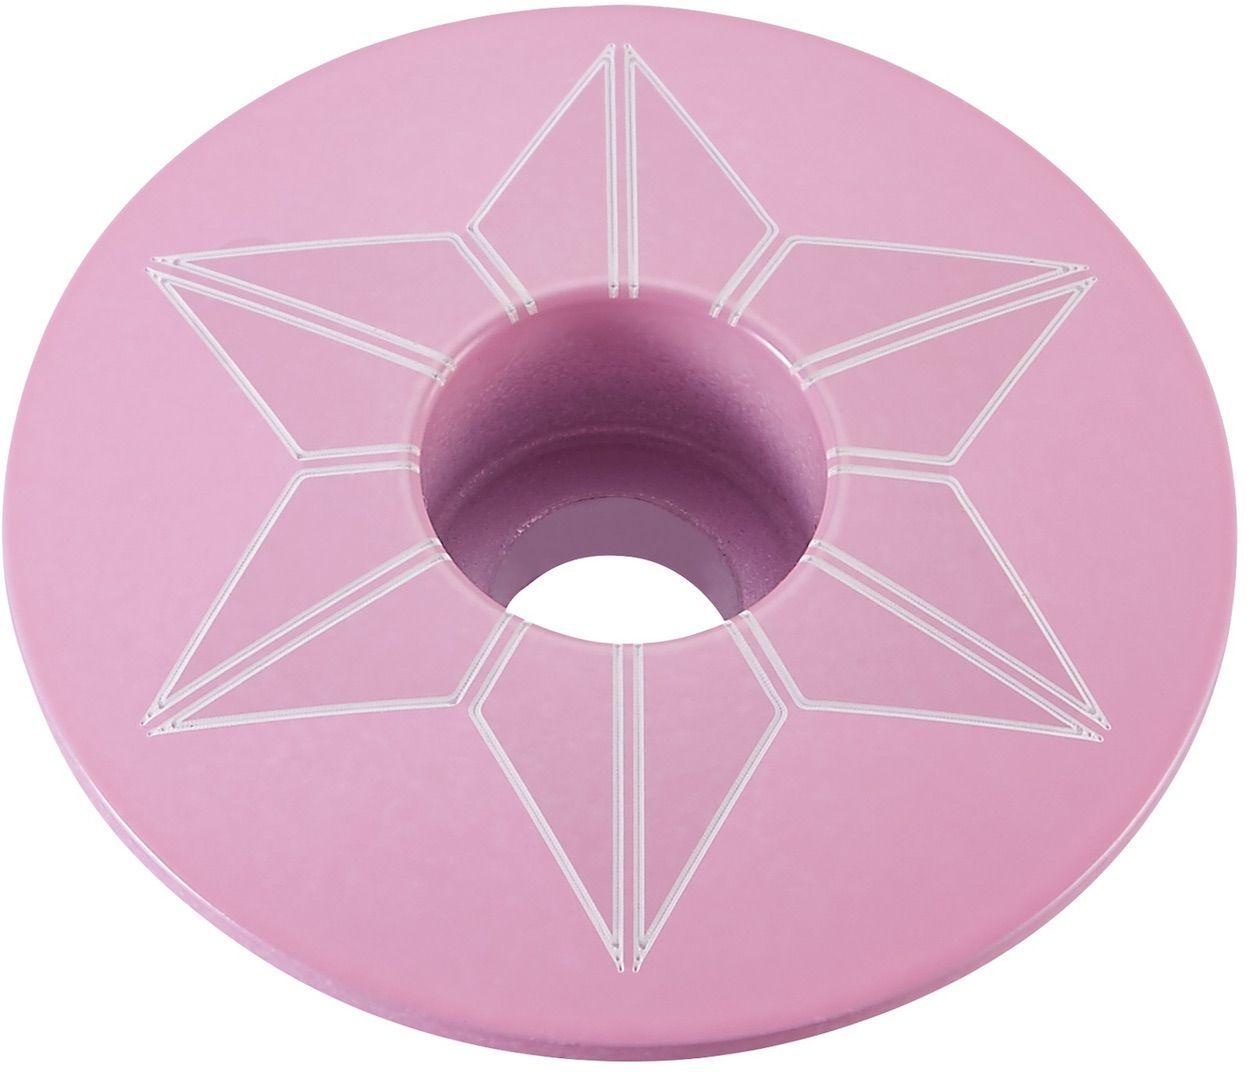 Supacaz Star Capz - Powder Coated - Giro Pink (powder coated) uni